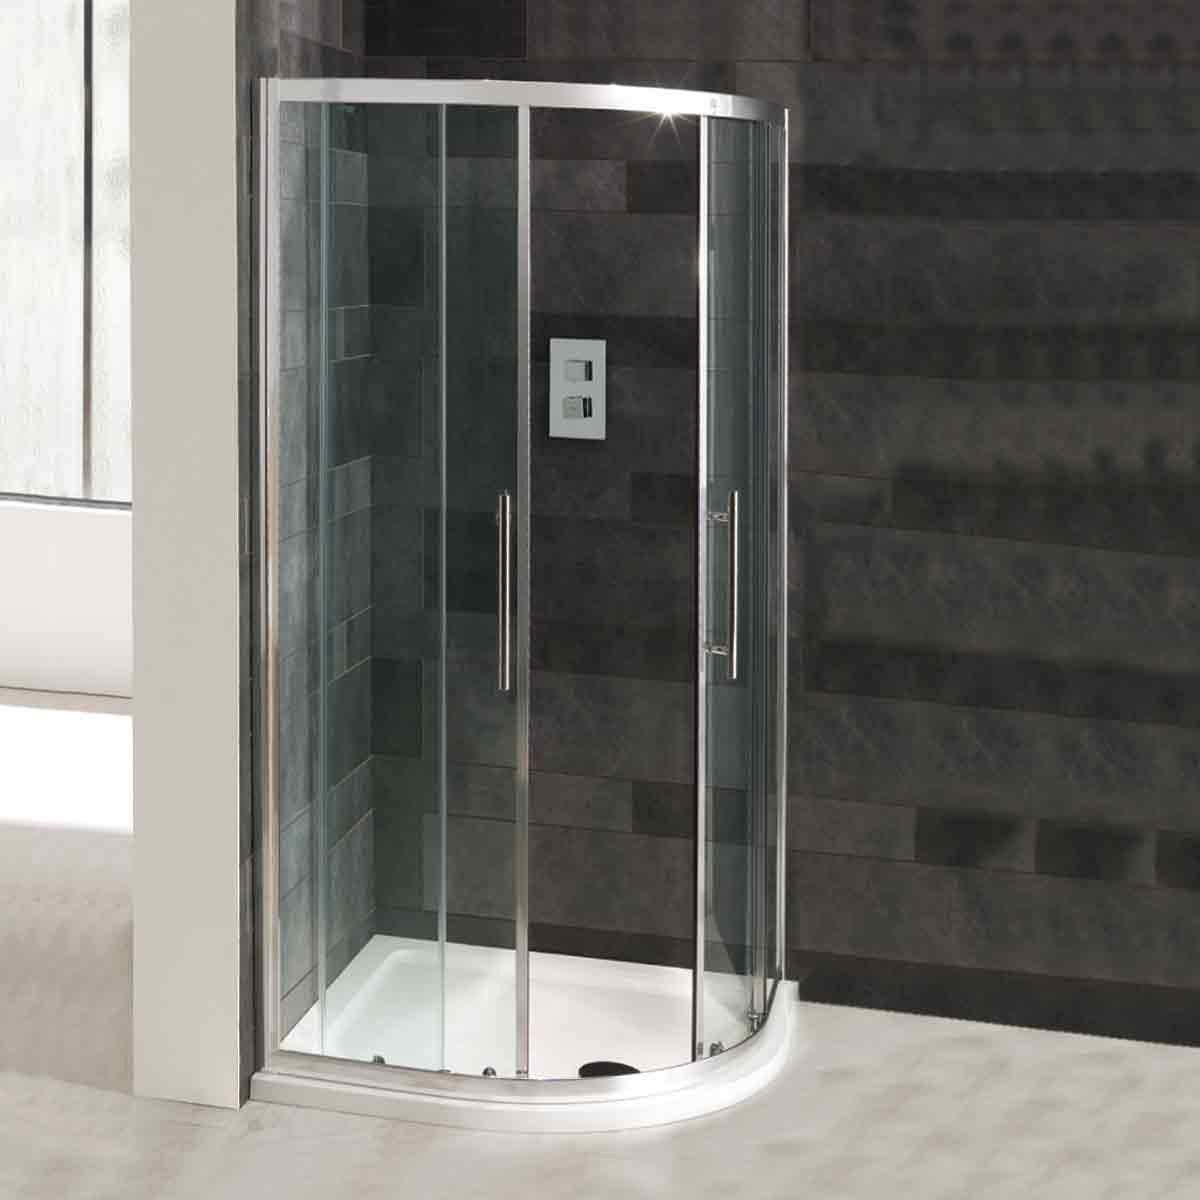 G6 Quadrant Shower Enclosure 800 x 800 Quadrant shower